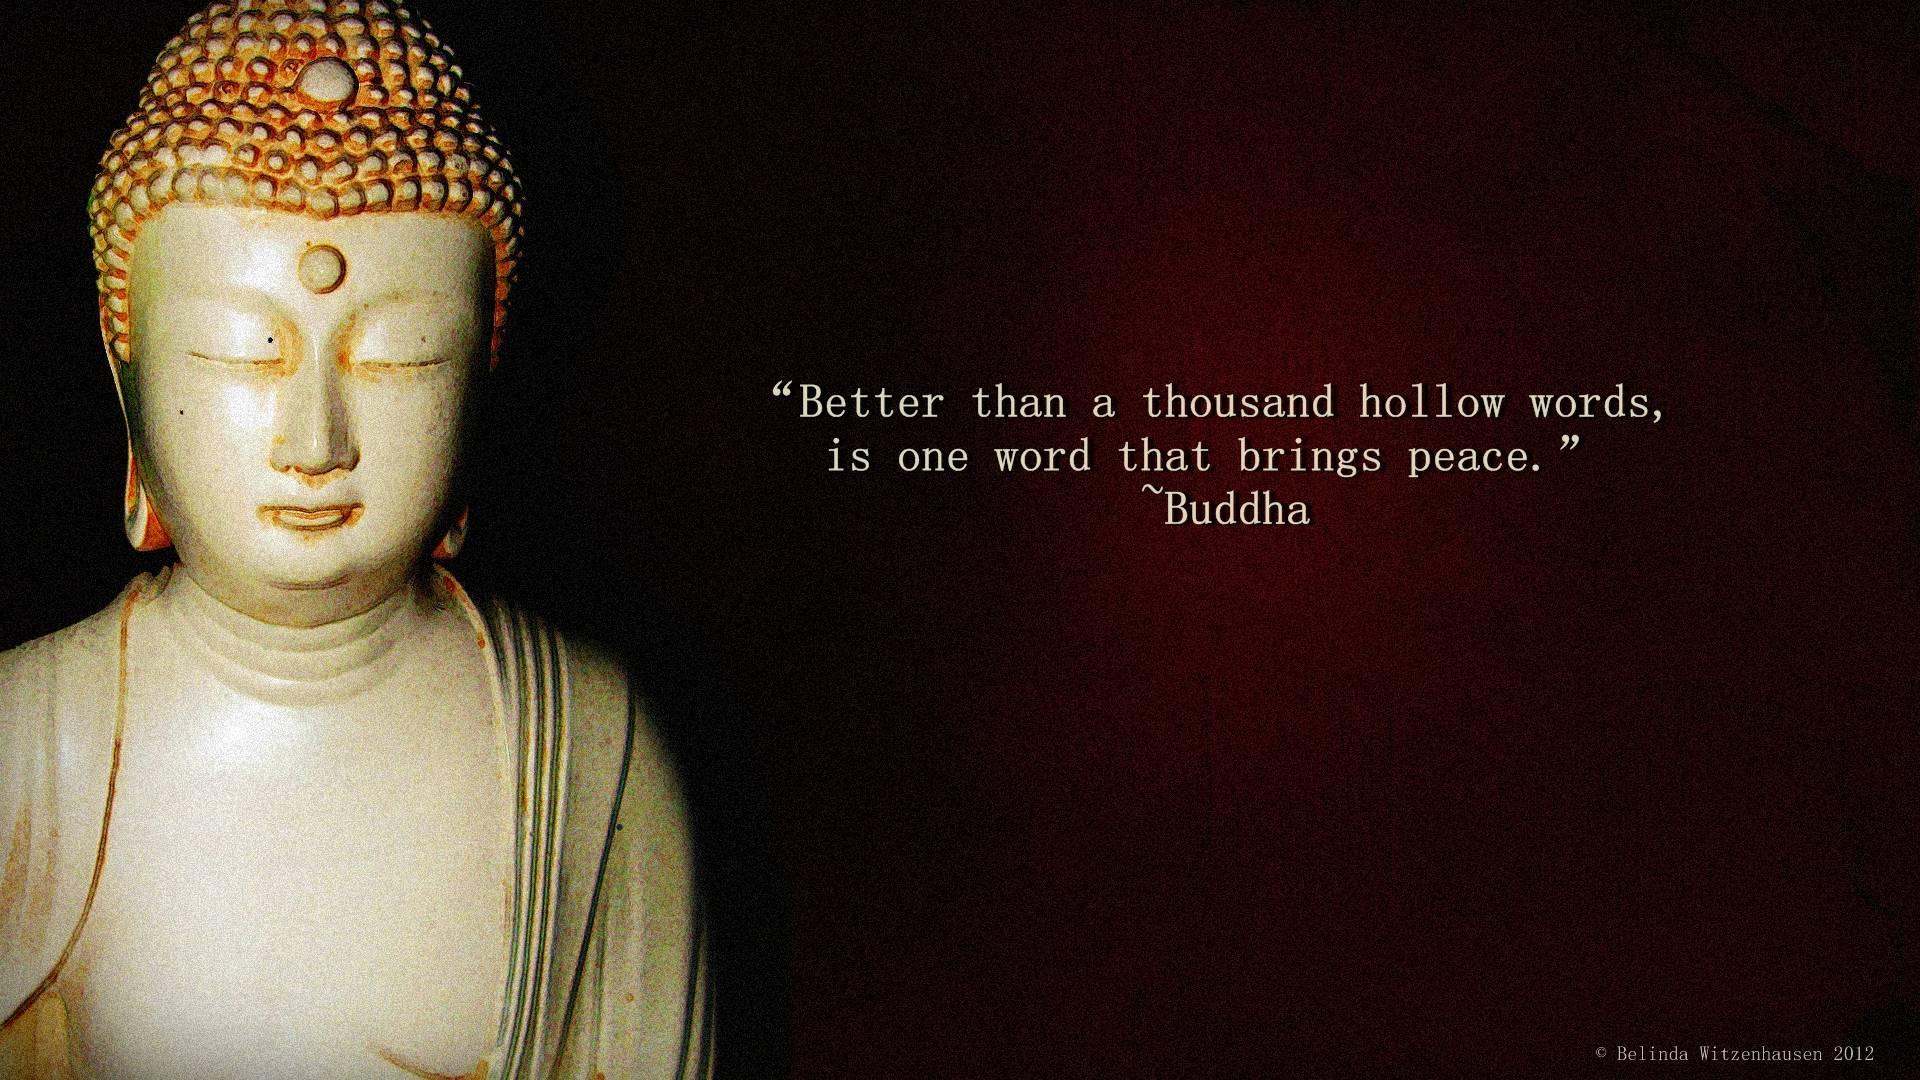 Buddha Quotes wallpaper - 610727